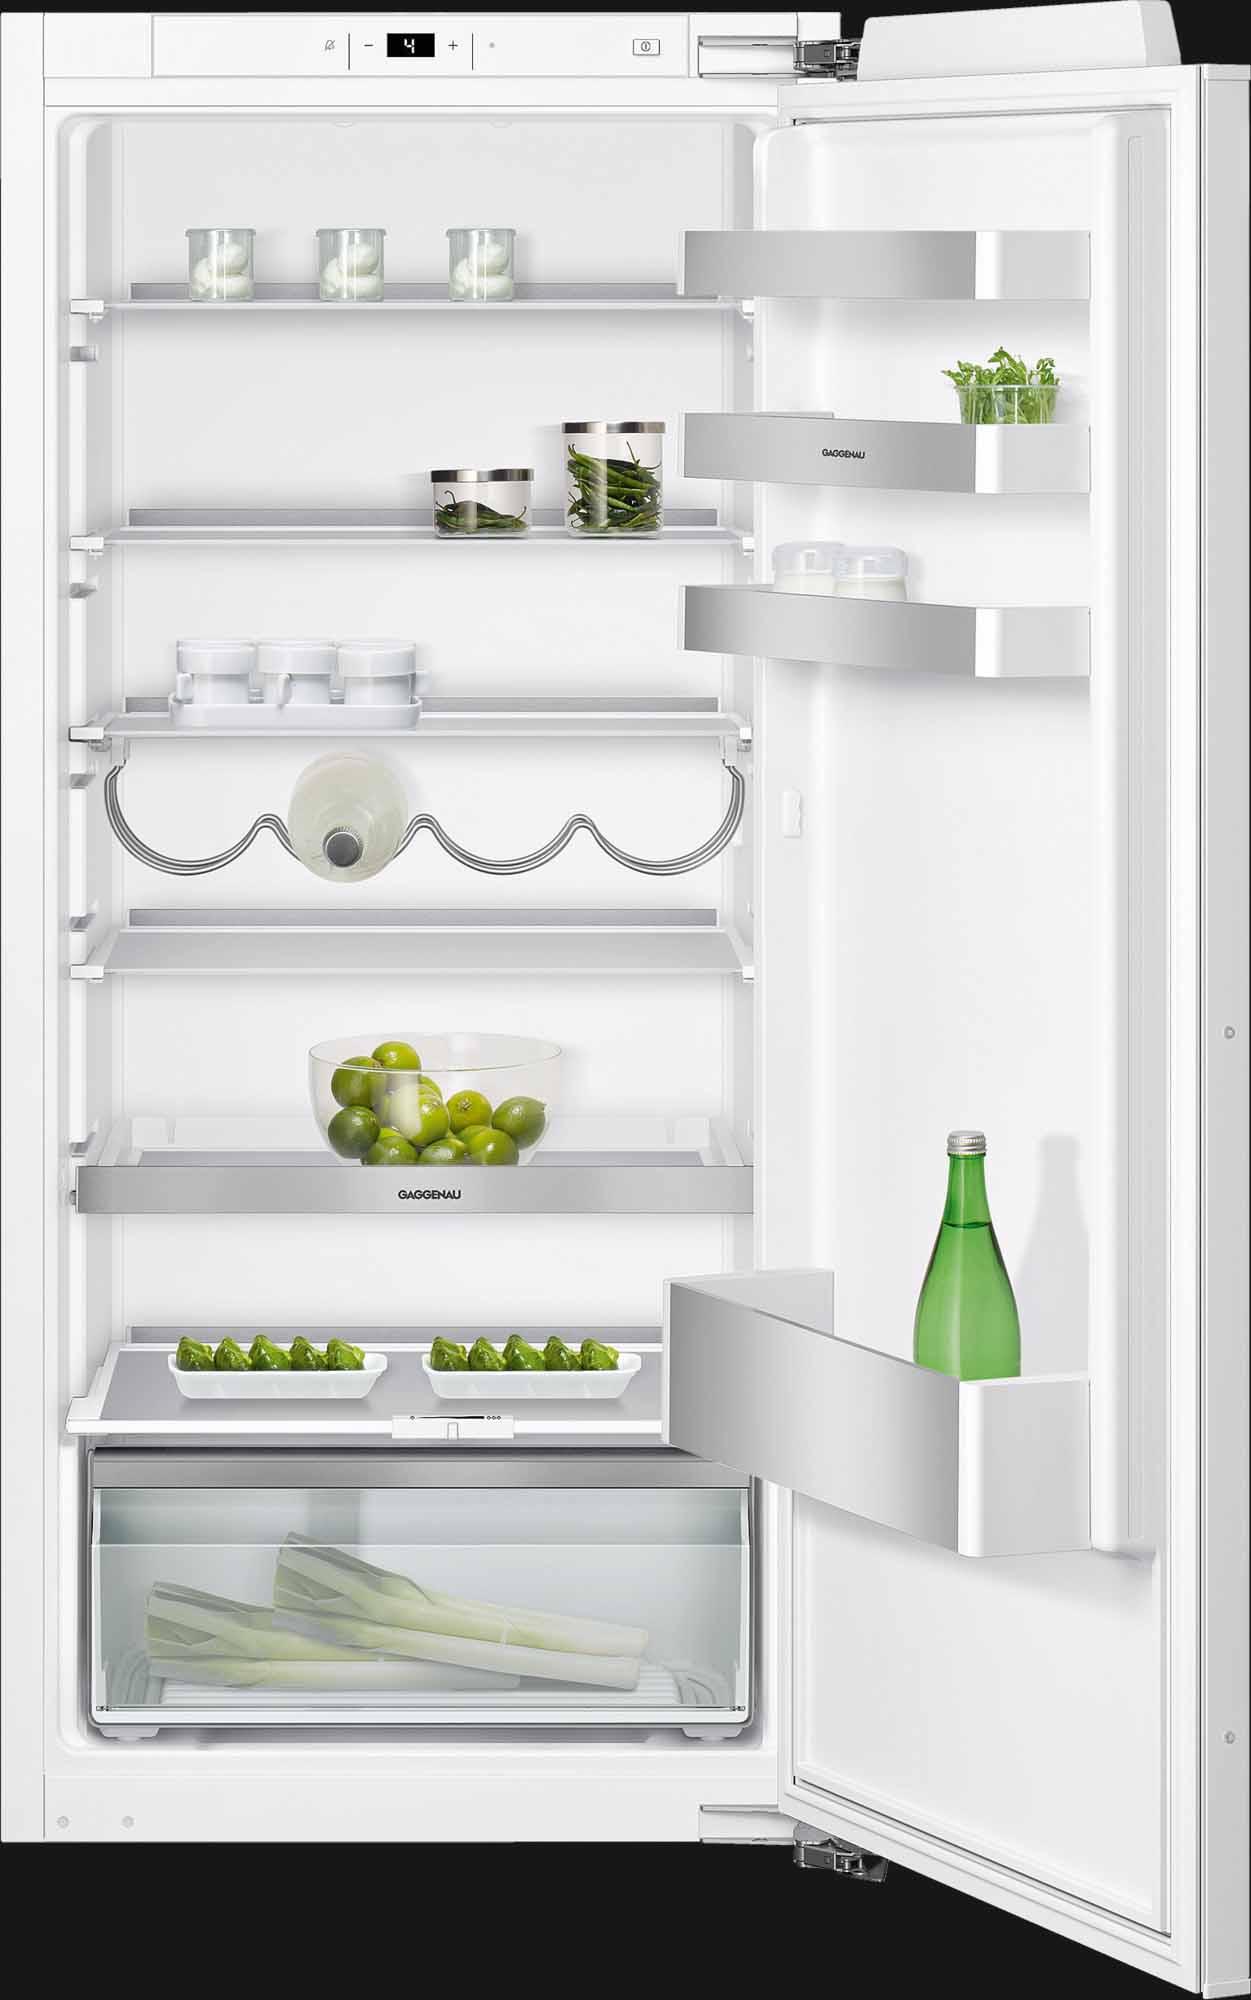 Холодильник GAGGENAU серии 200 RC222203